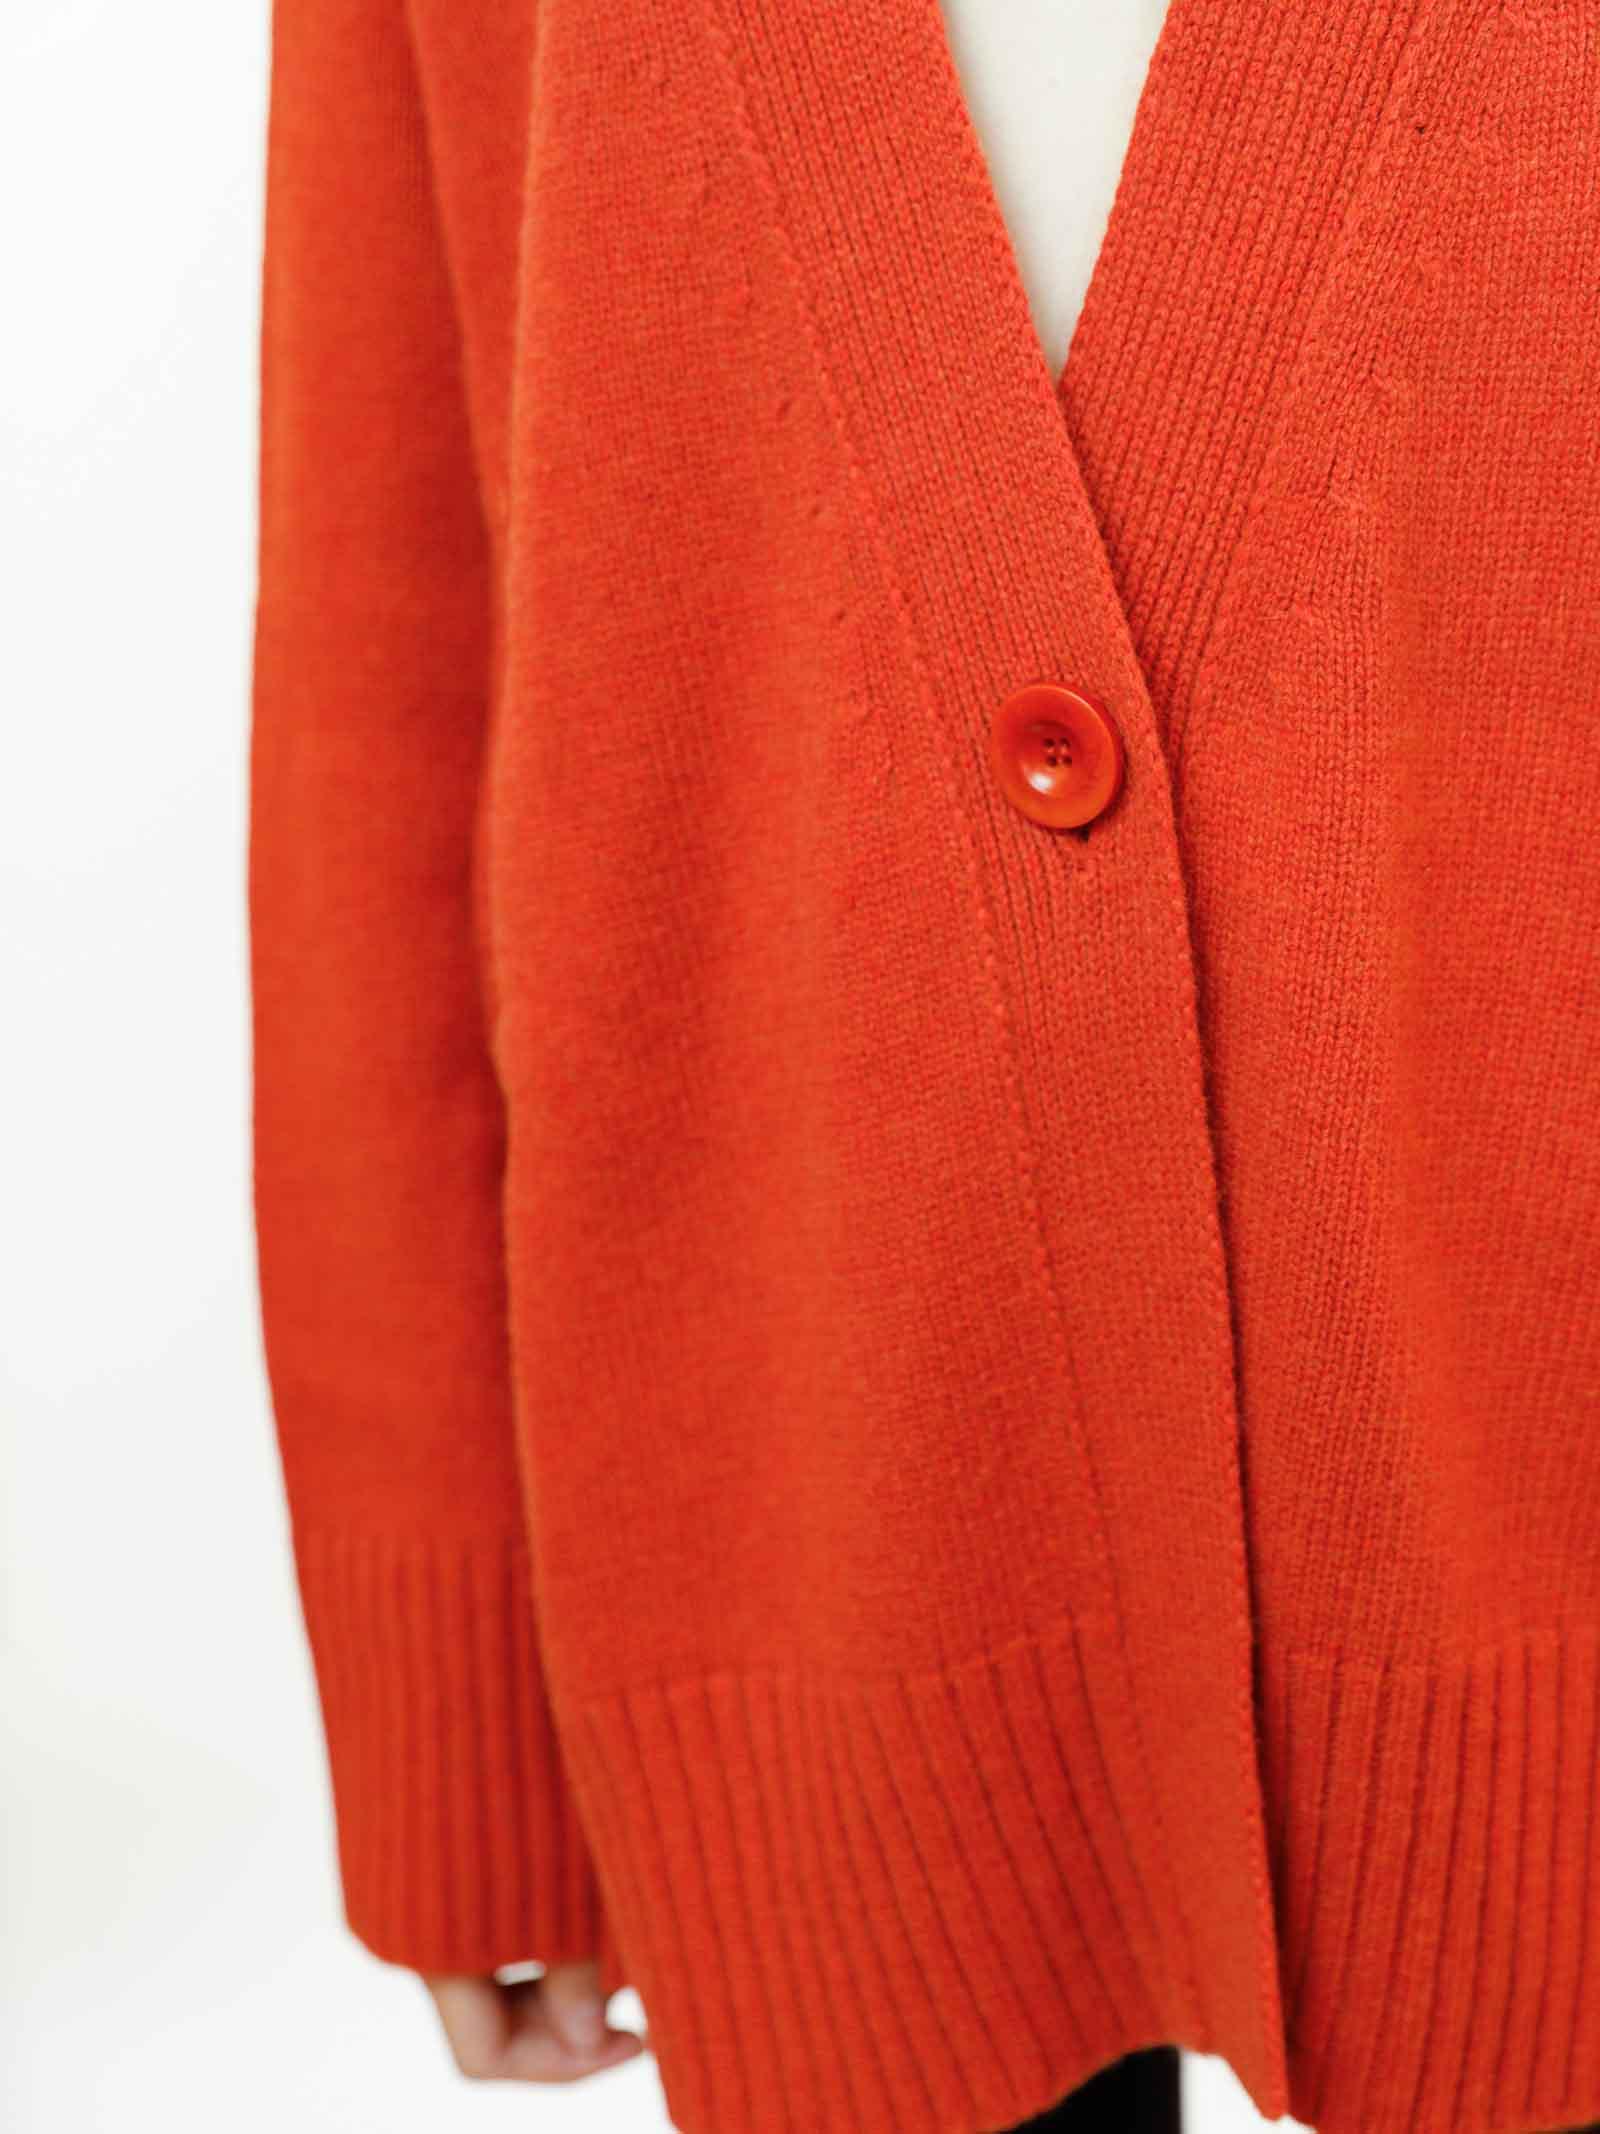 Women's Clothing Maxi Cardigan in Rusty Cashmere with Matching Buttons Maliparmi   Knitwear   JN35797431531038